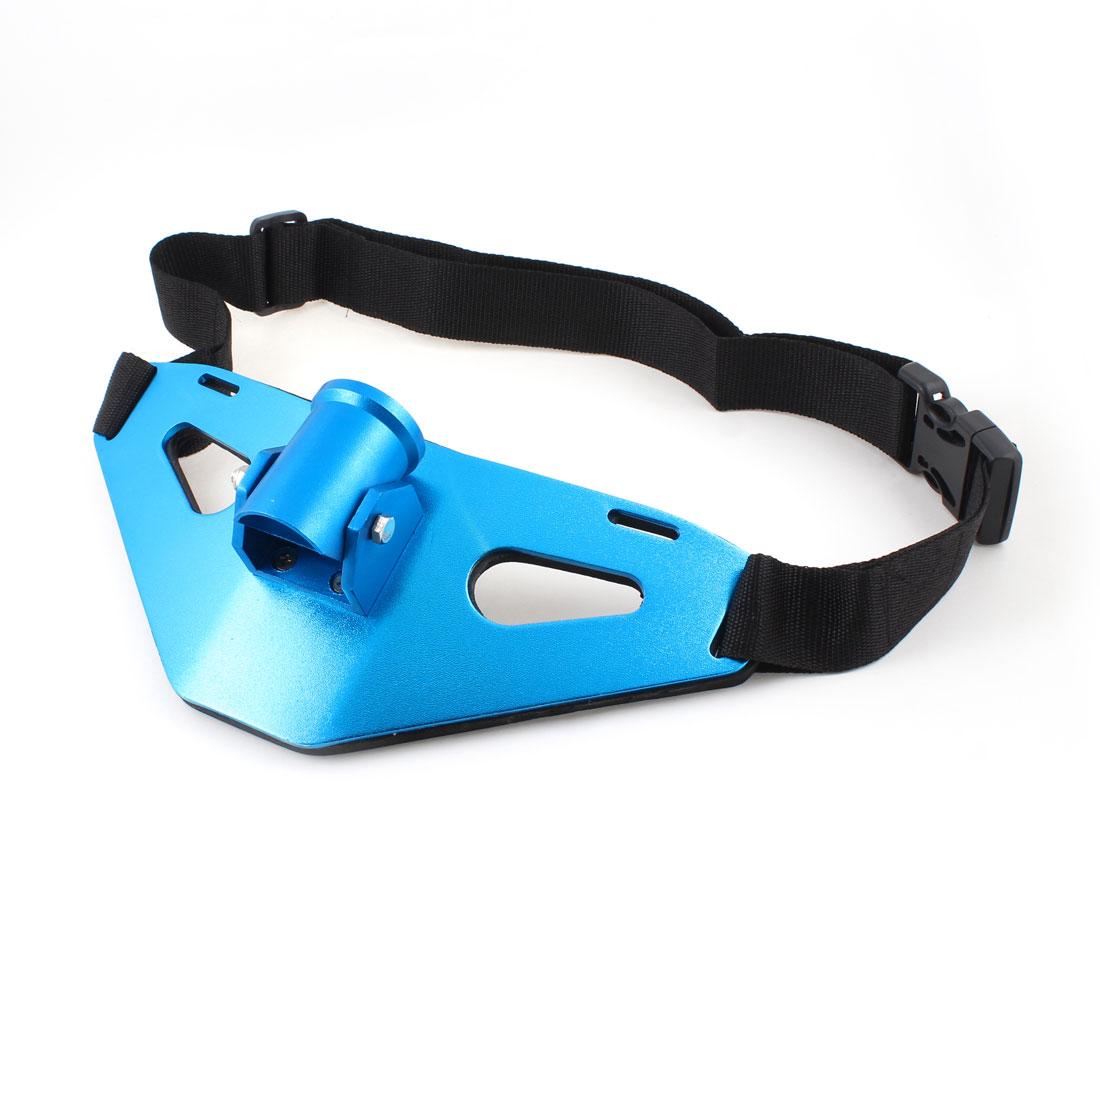 "Fishing Rod Holder Gear Alloy Waist Belly Fighting Belt Blue 1.5"" Inner Dia"